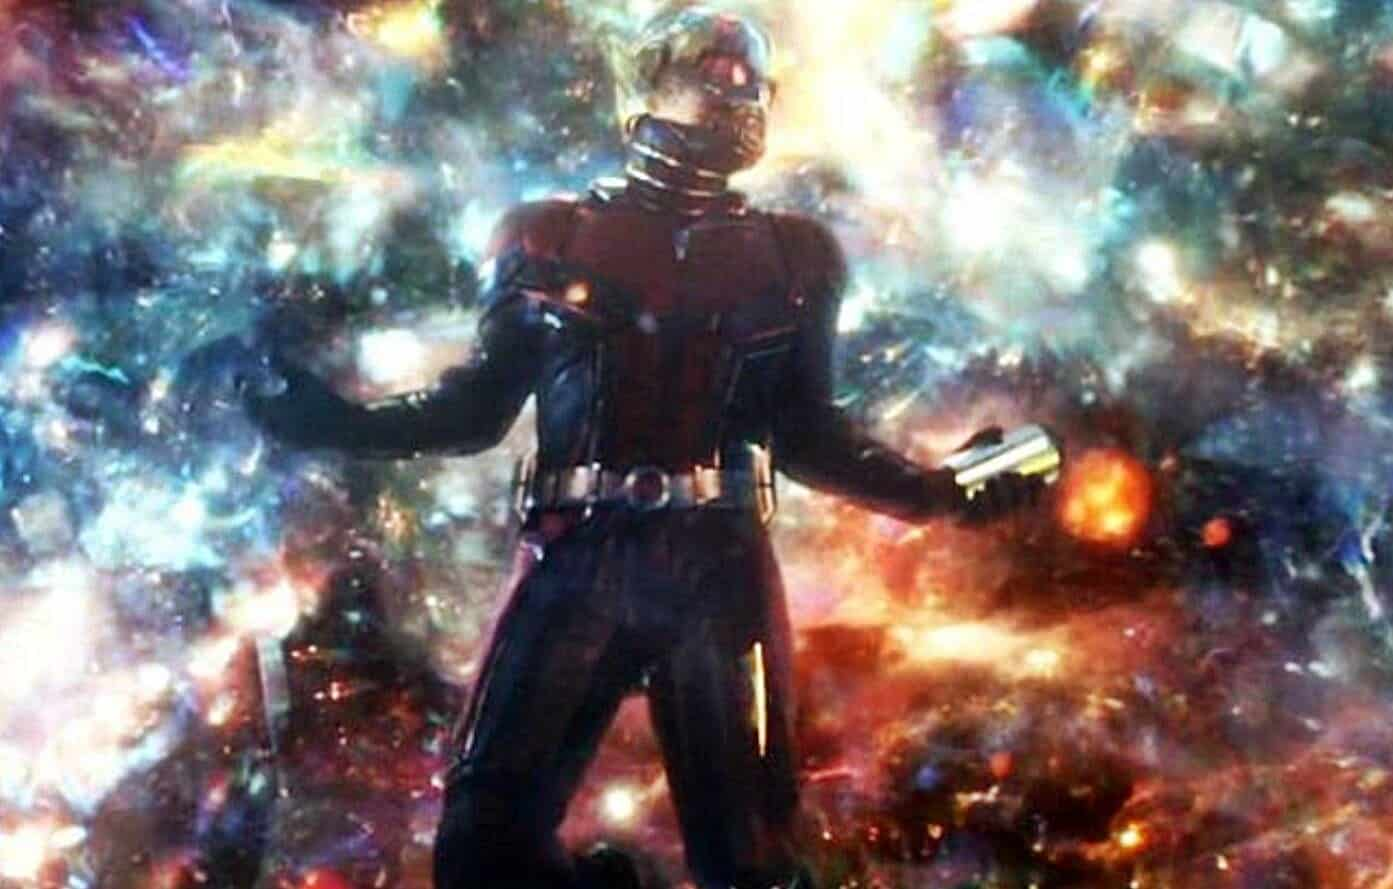 Avengers; Endgame Quantum Realm